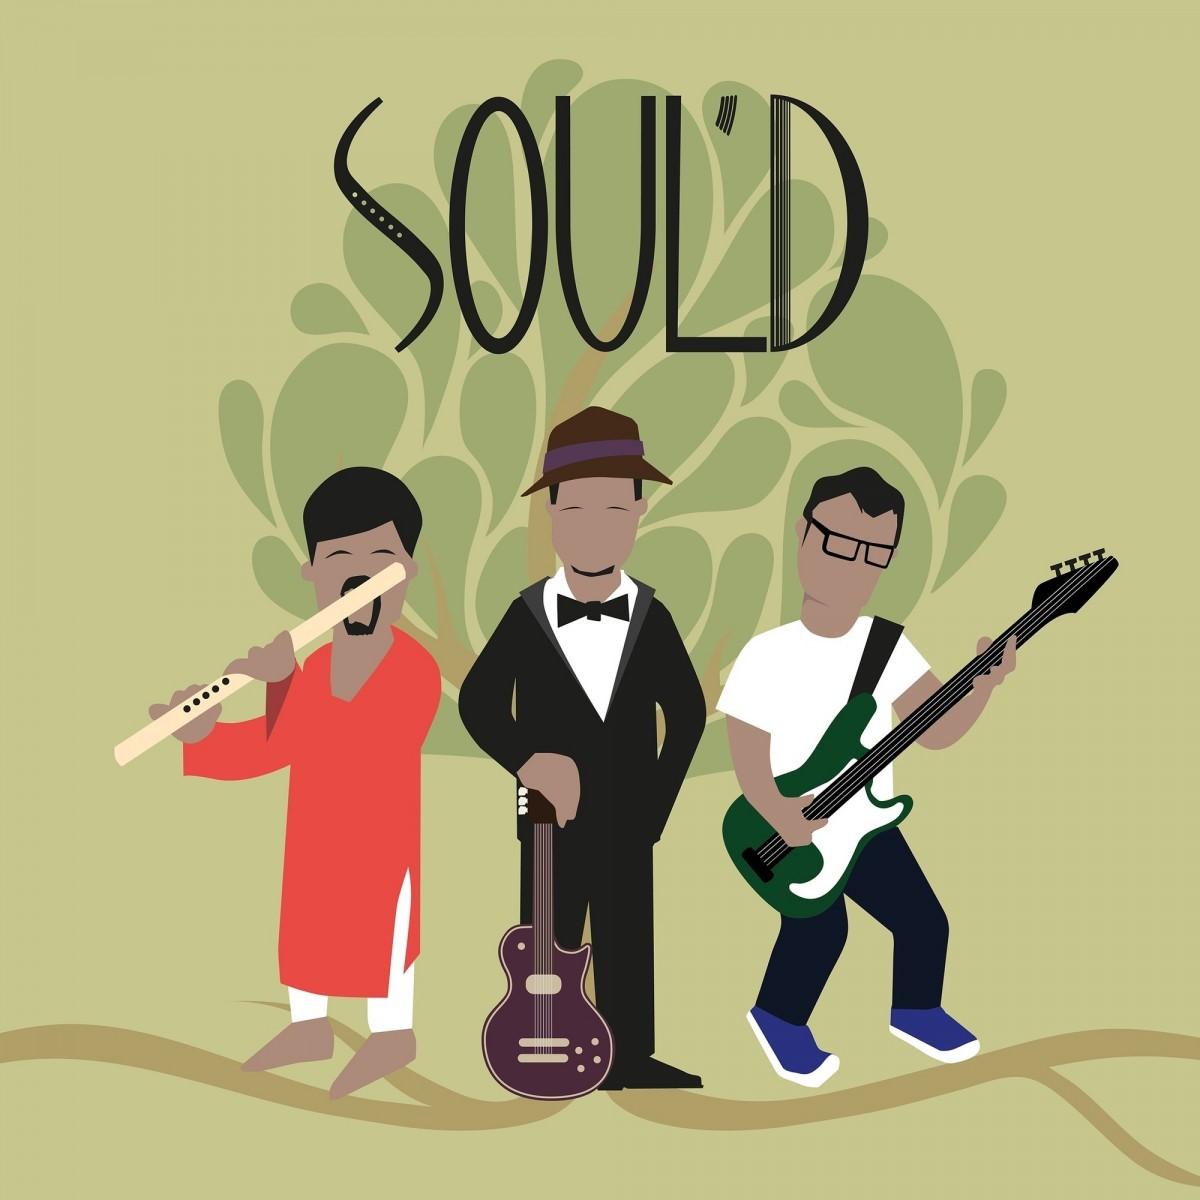 soul'd